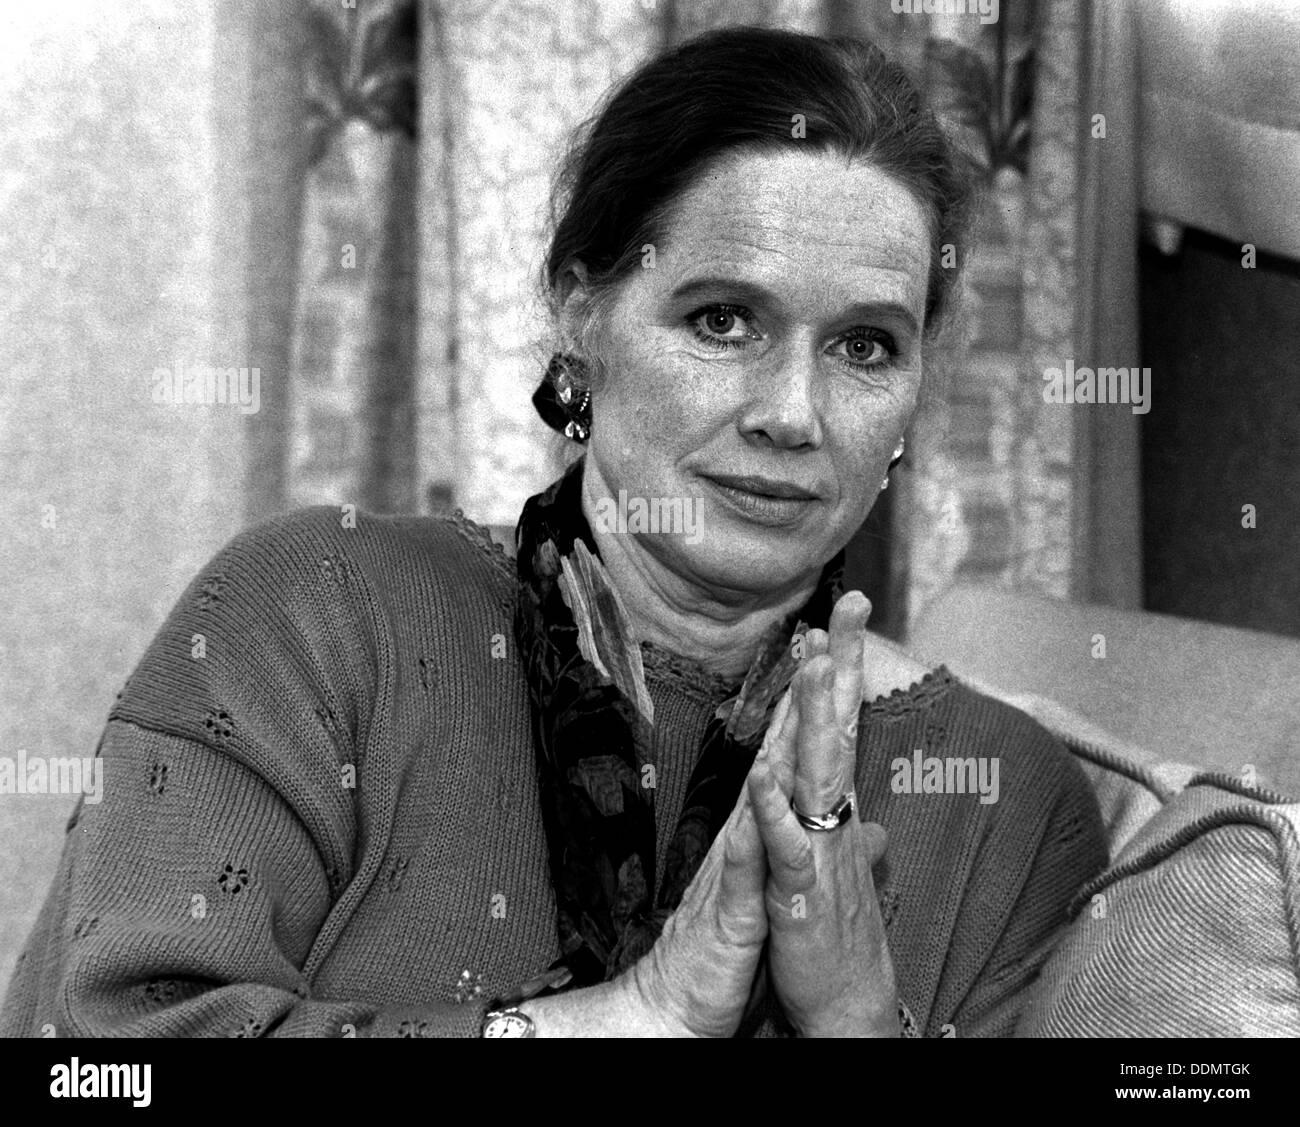 Liv Ullmann (1932- ), Norwegian actress, 1993. Artist: Sidney Harris - Stock Image